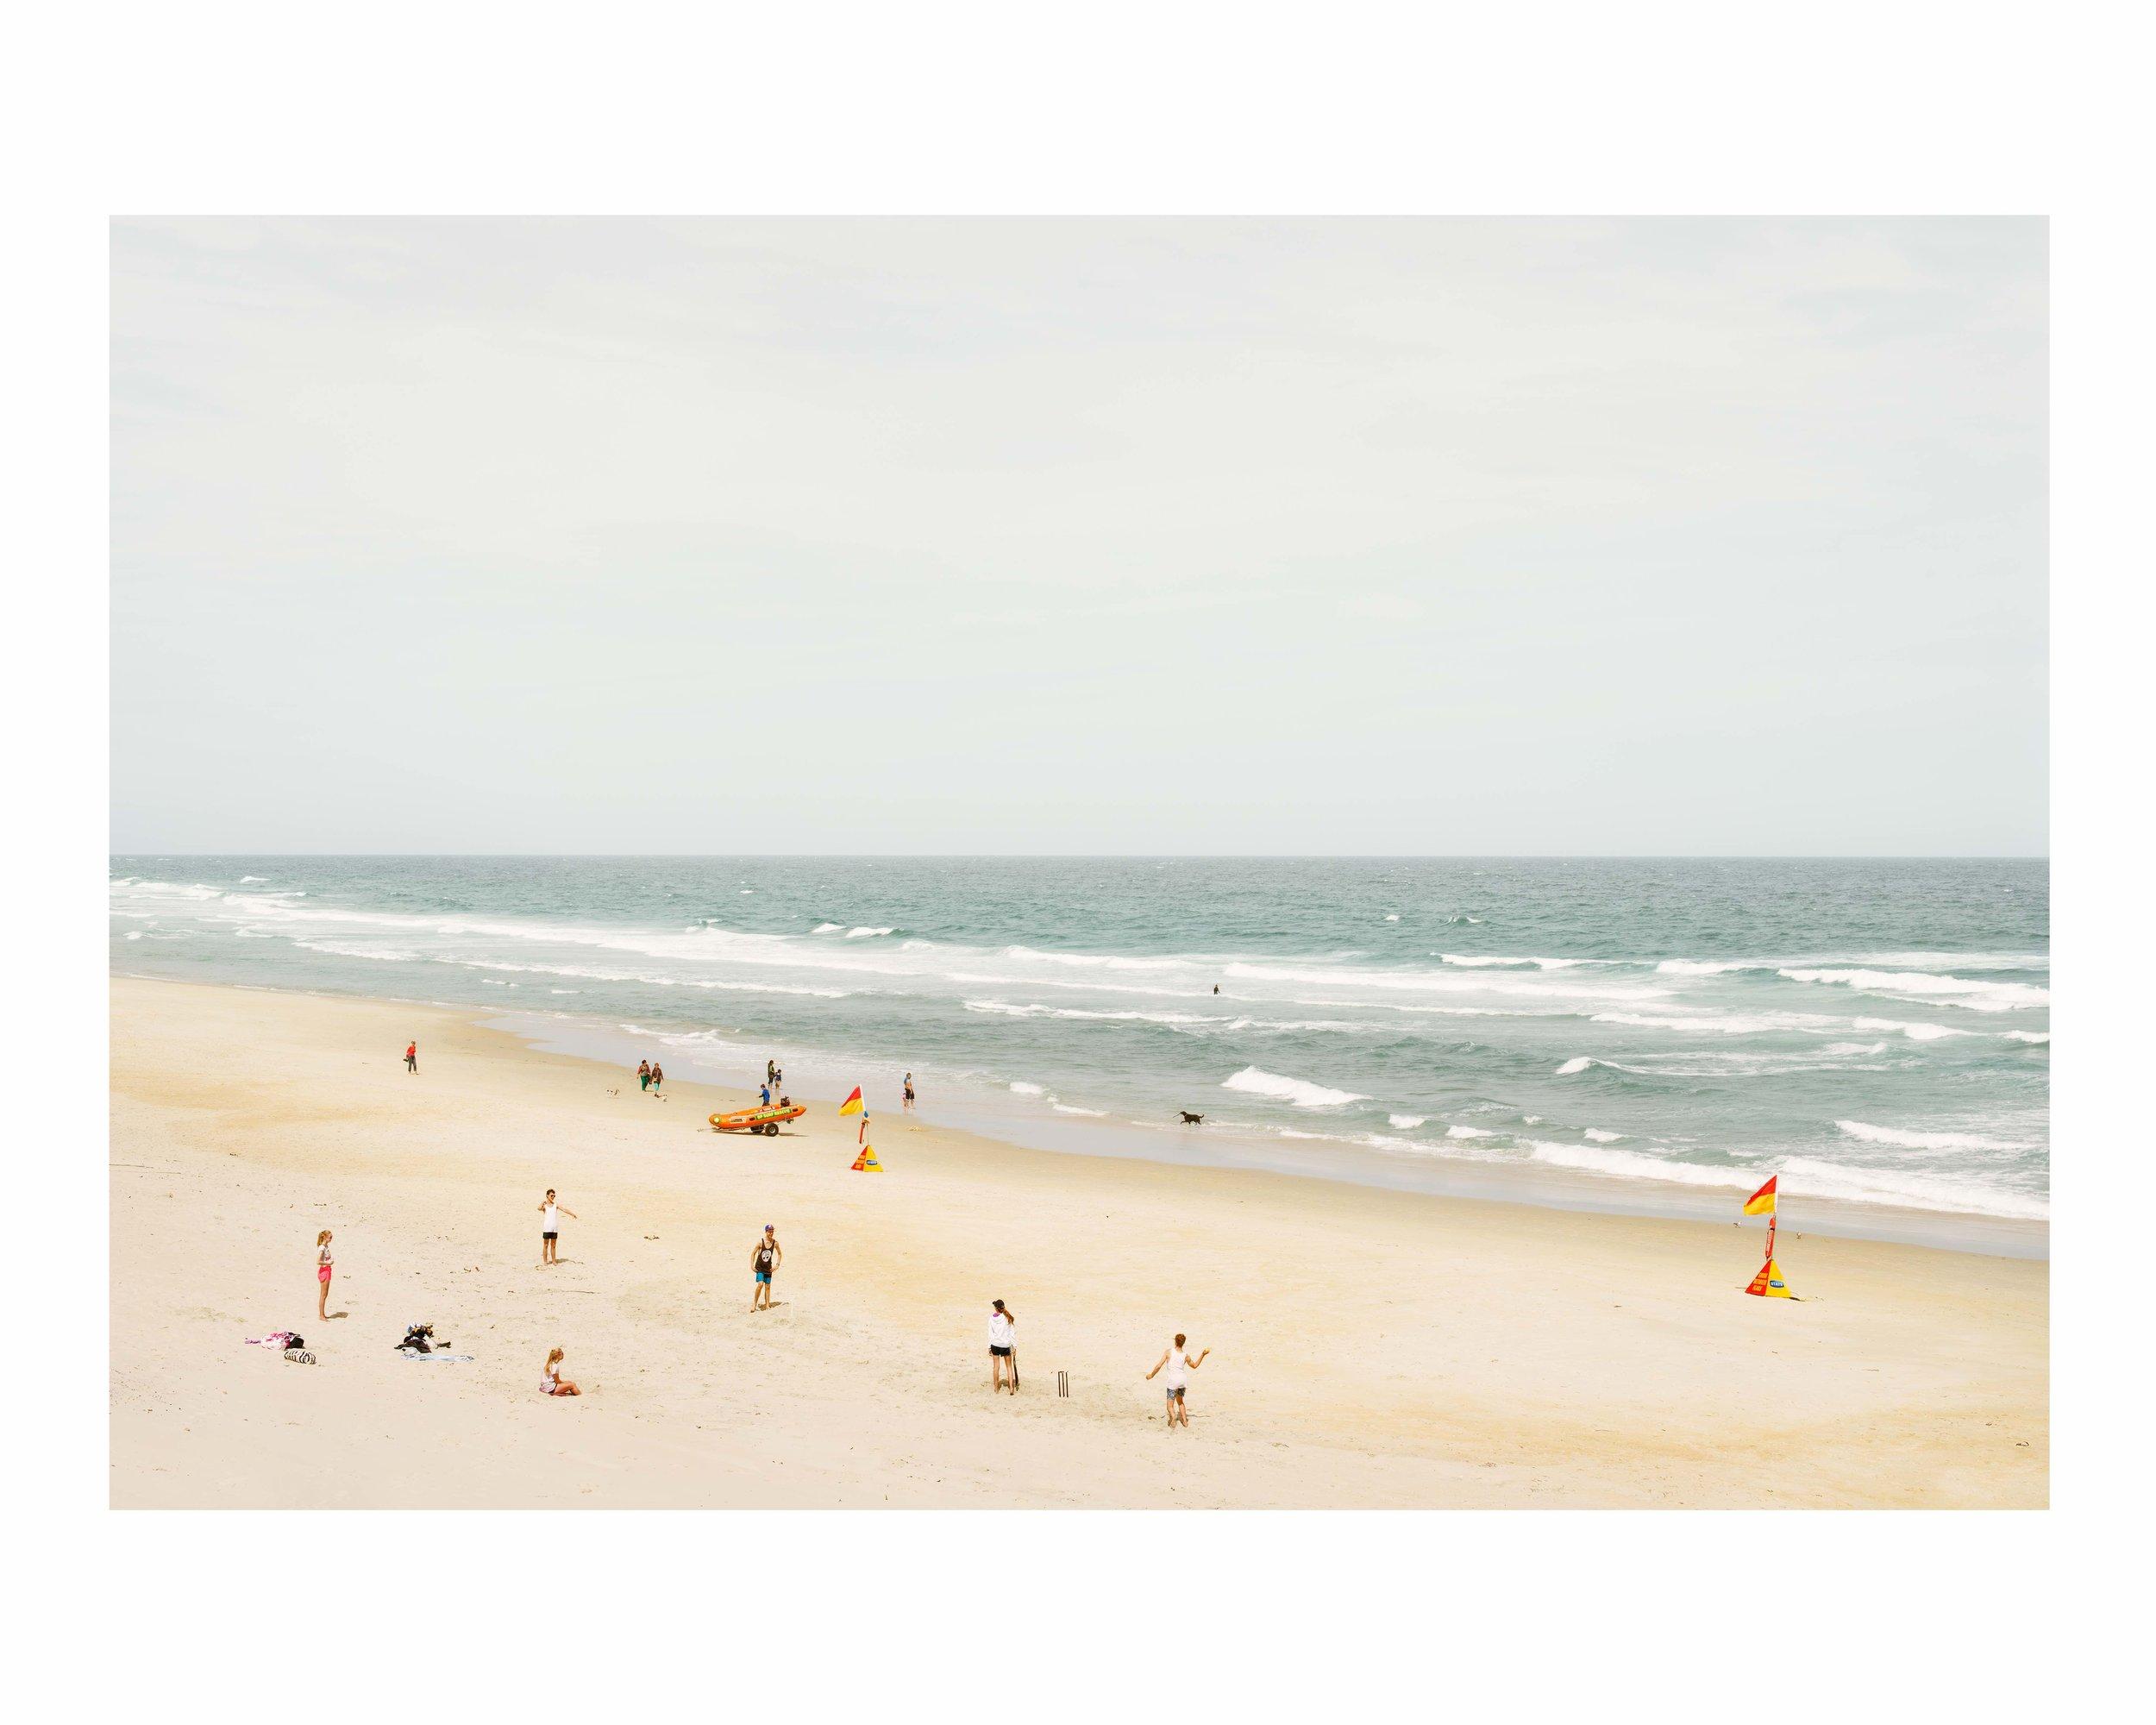 IMI_Chris Sisarich_St Kilda Beach.jpg